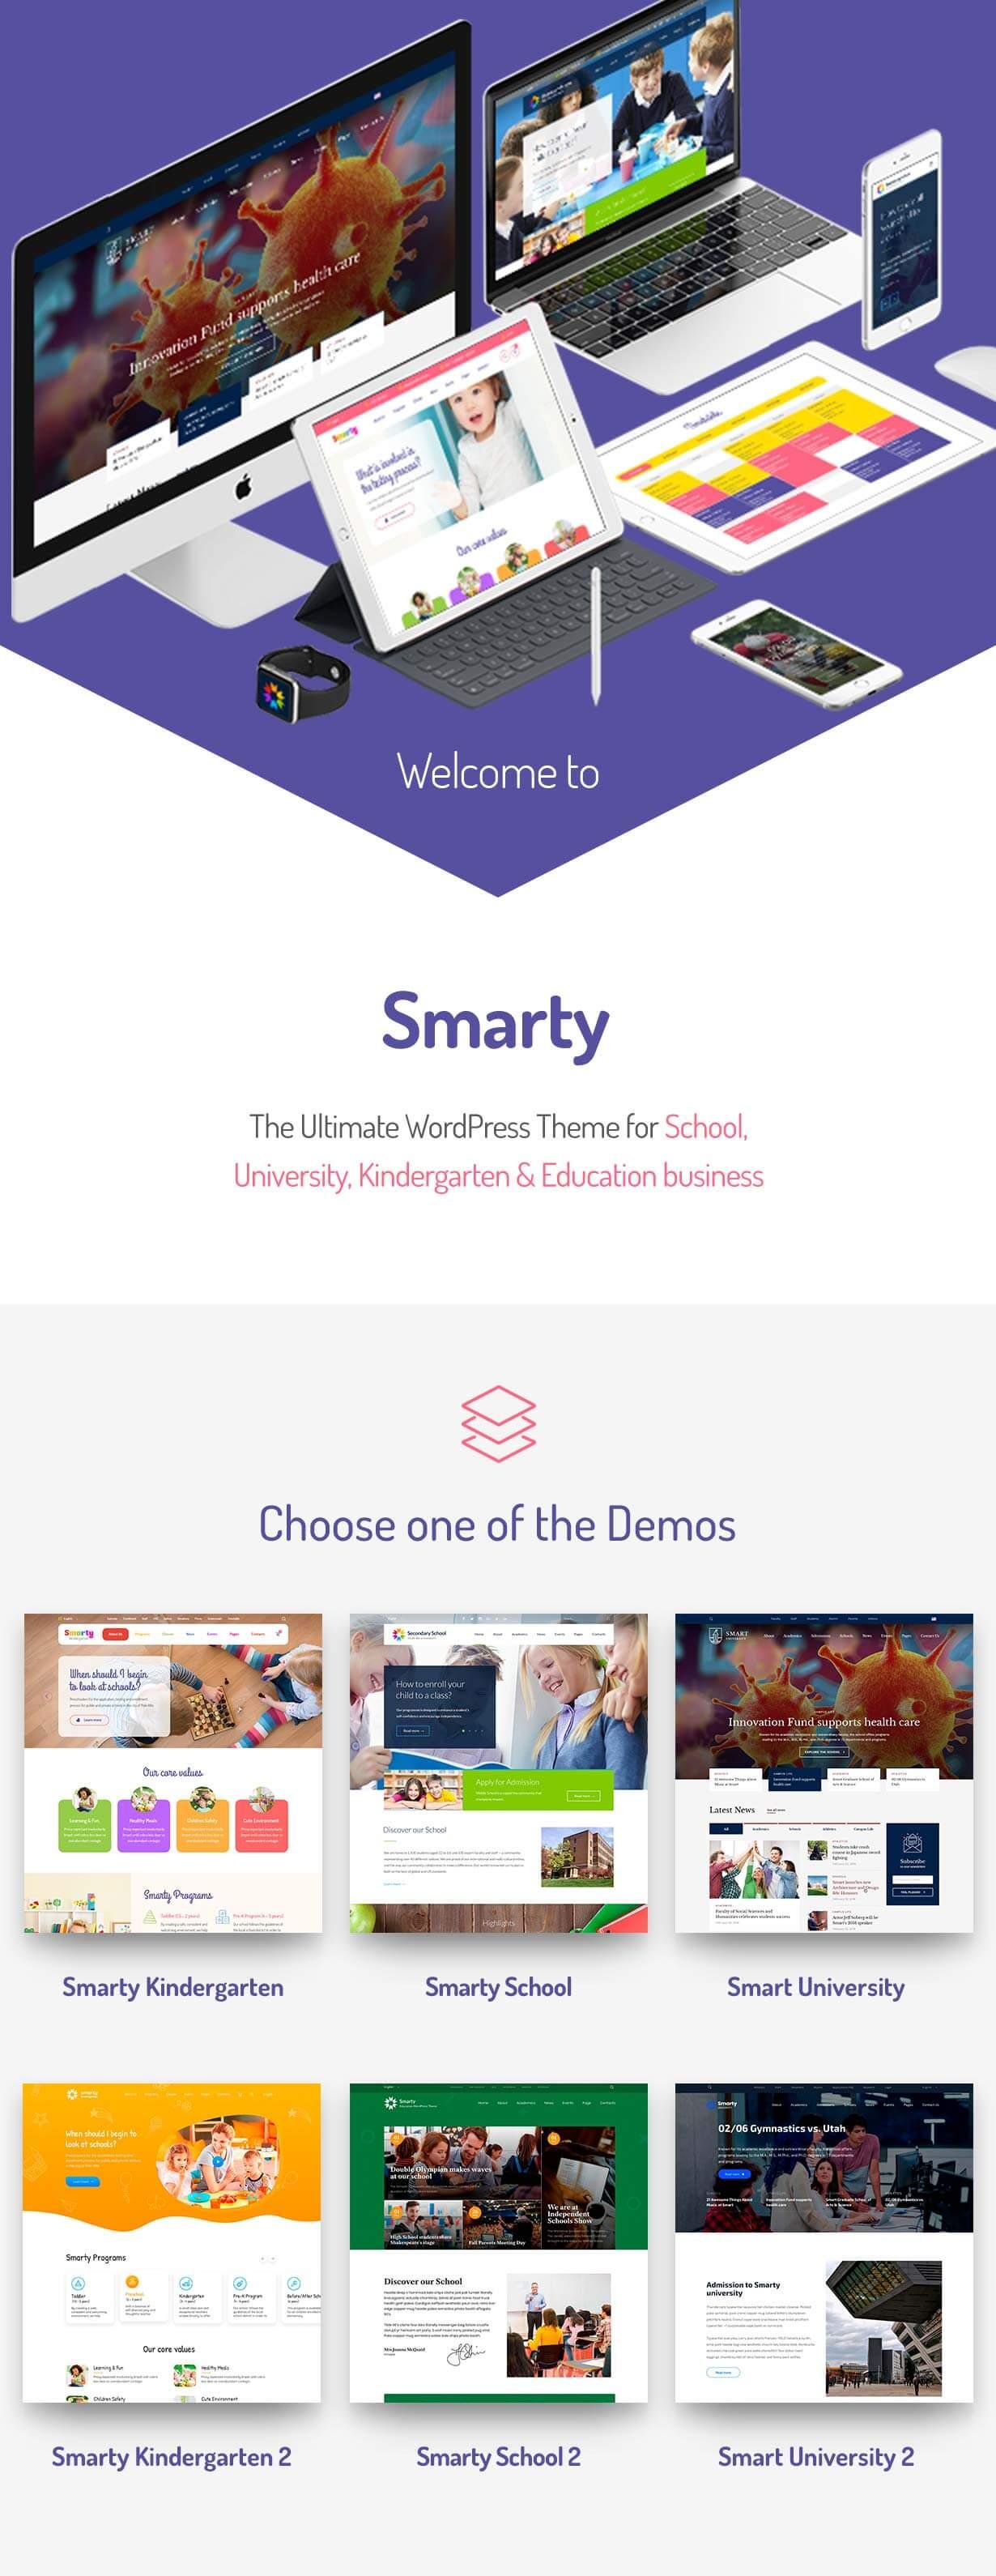 promo 1 - Smarty - School Kindergarten WordPress theme